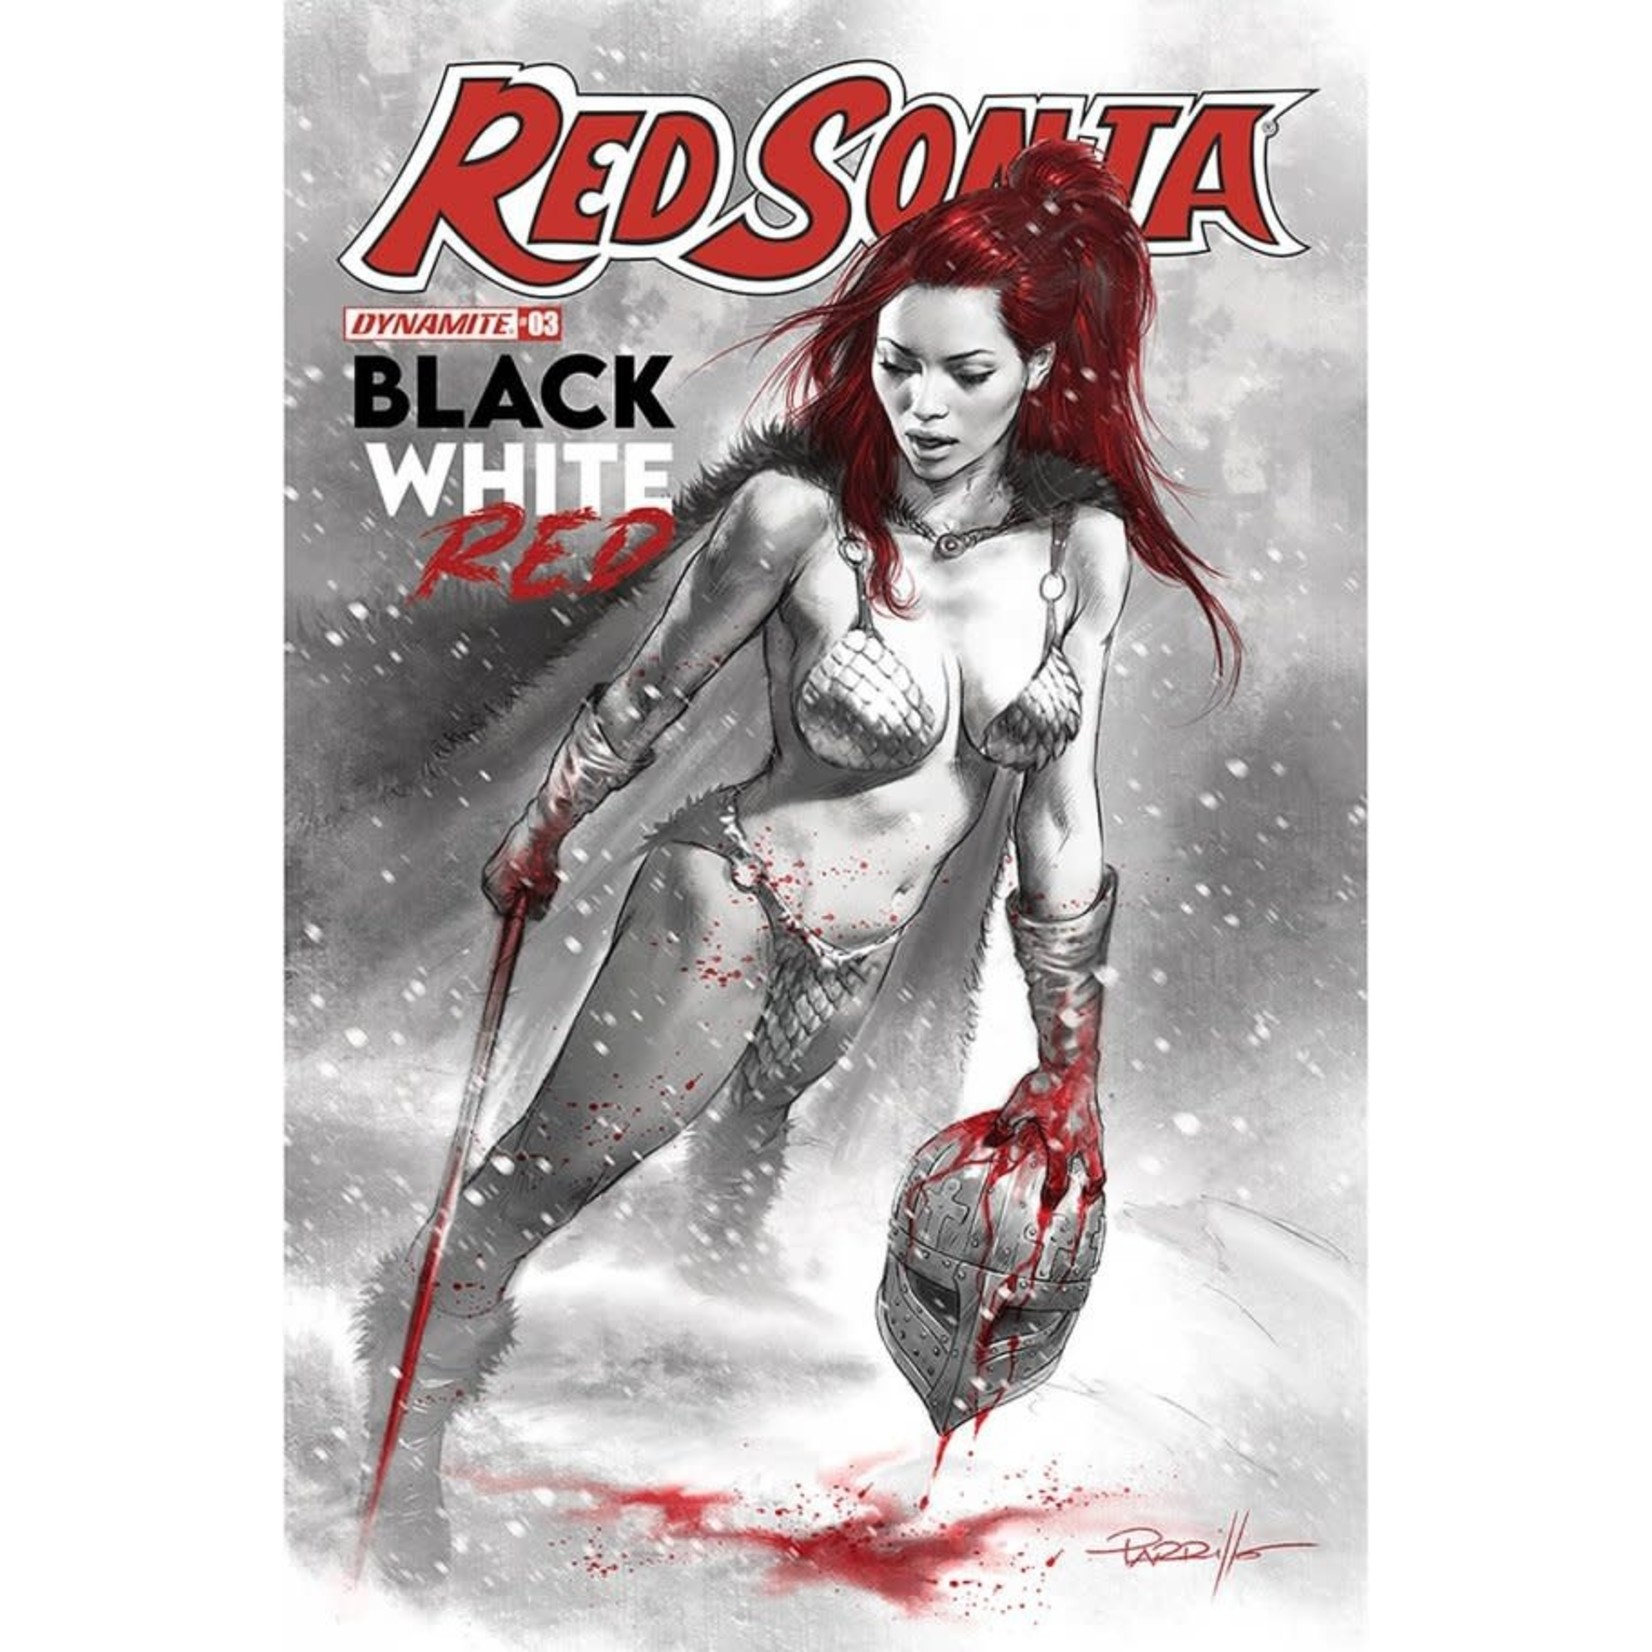 Dynamite Red Sonja: Black, White, Red #3